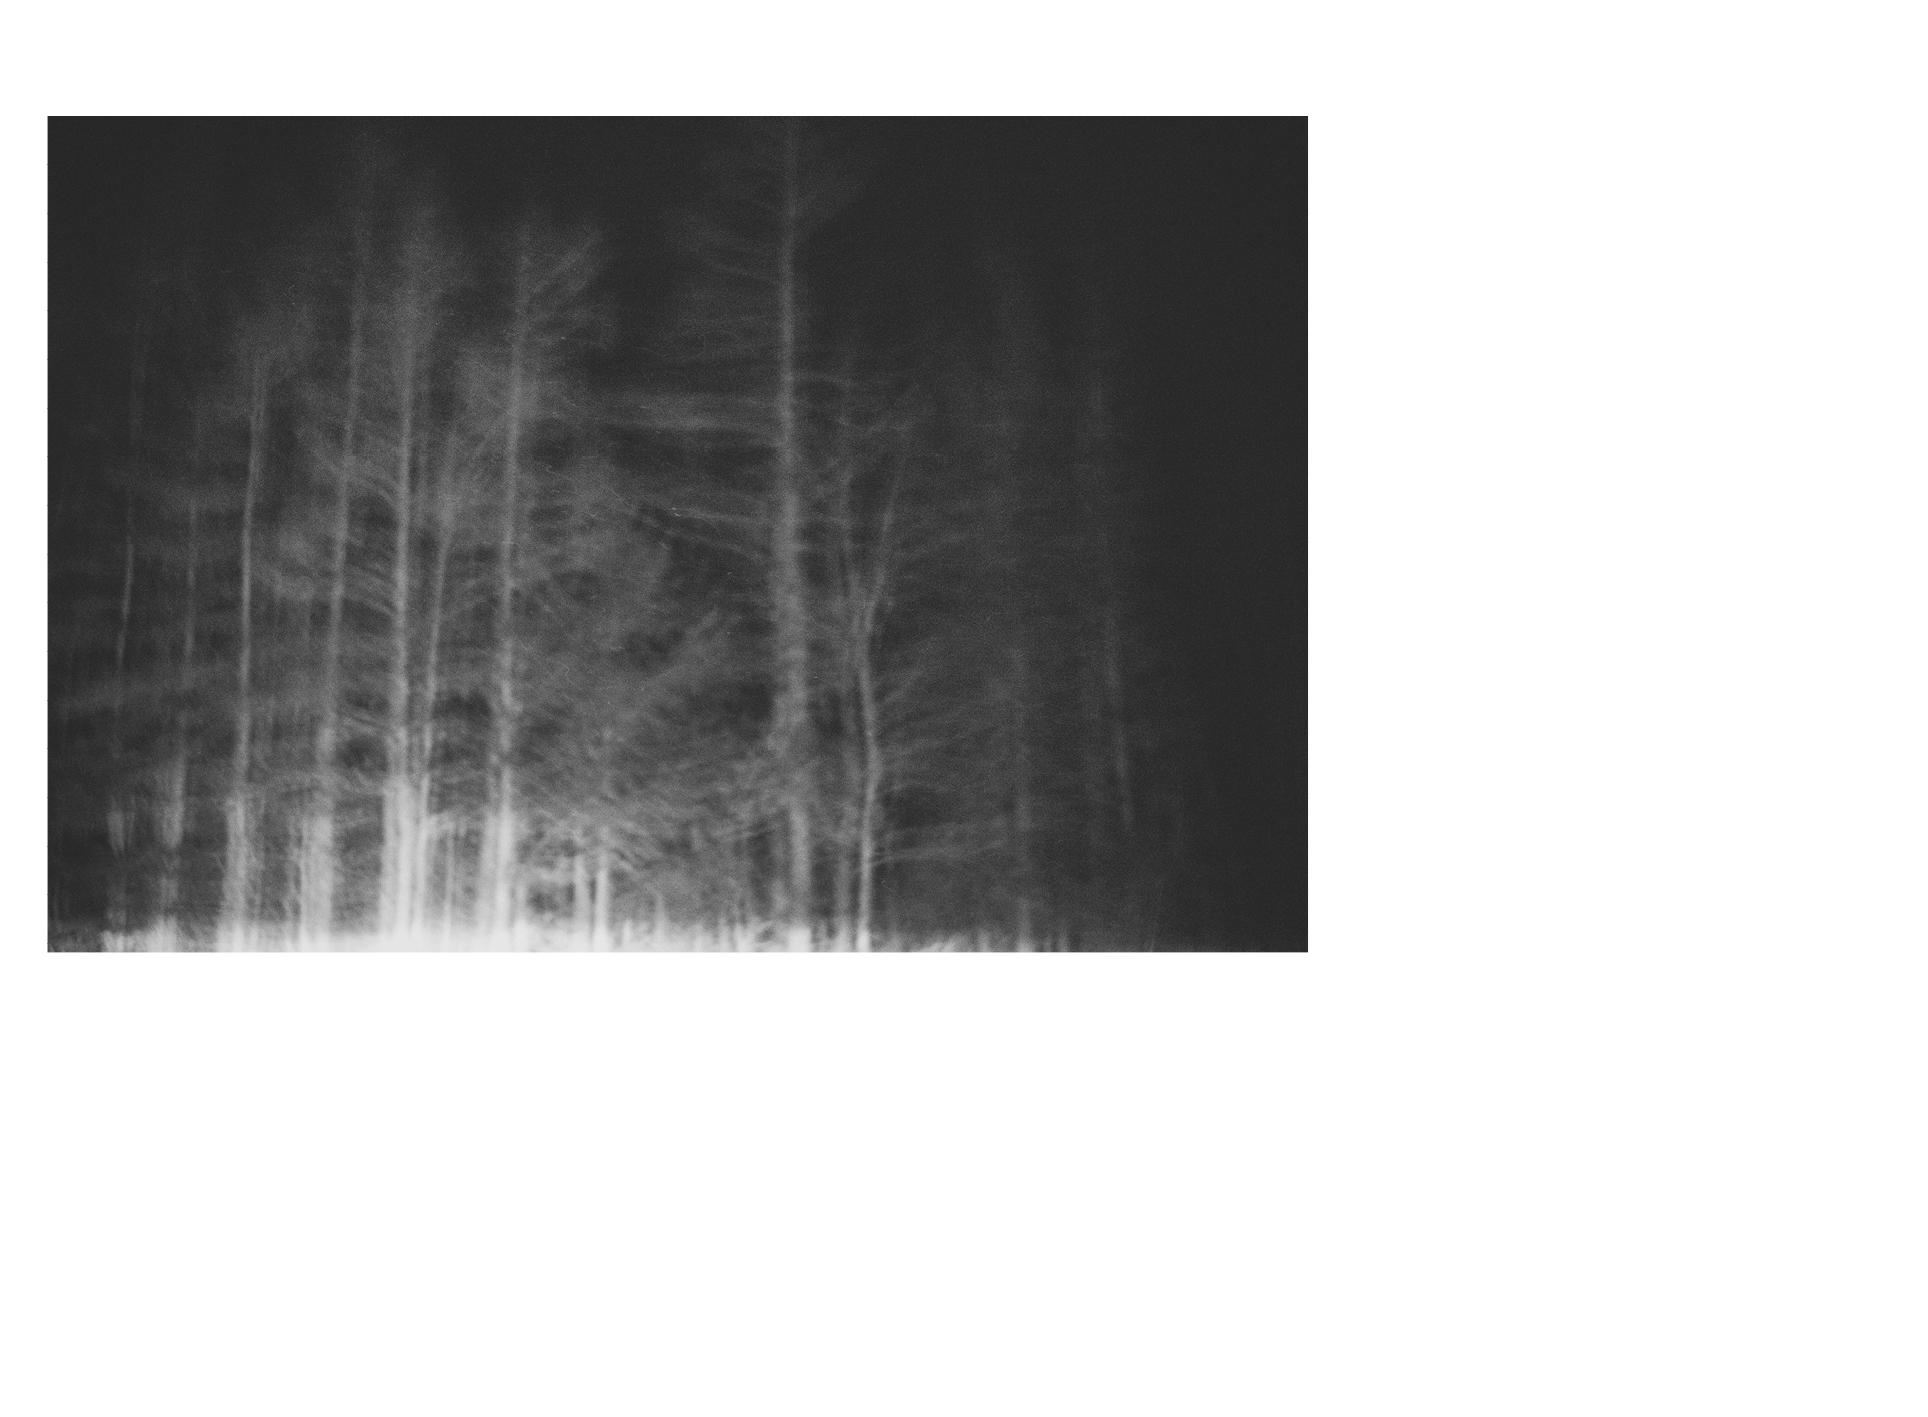 test31a.jpg